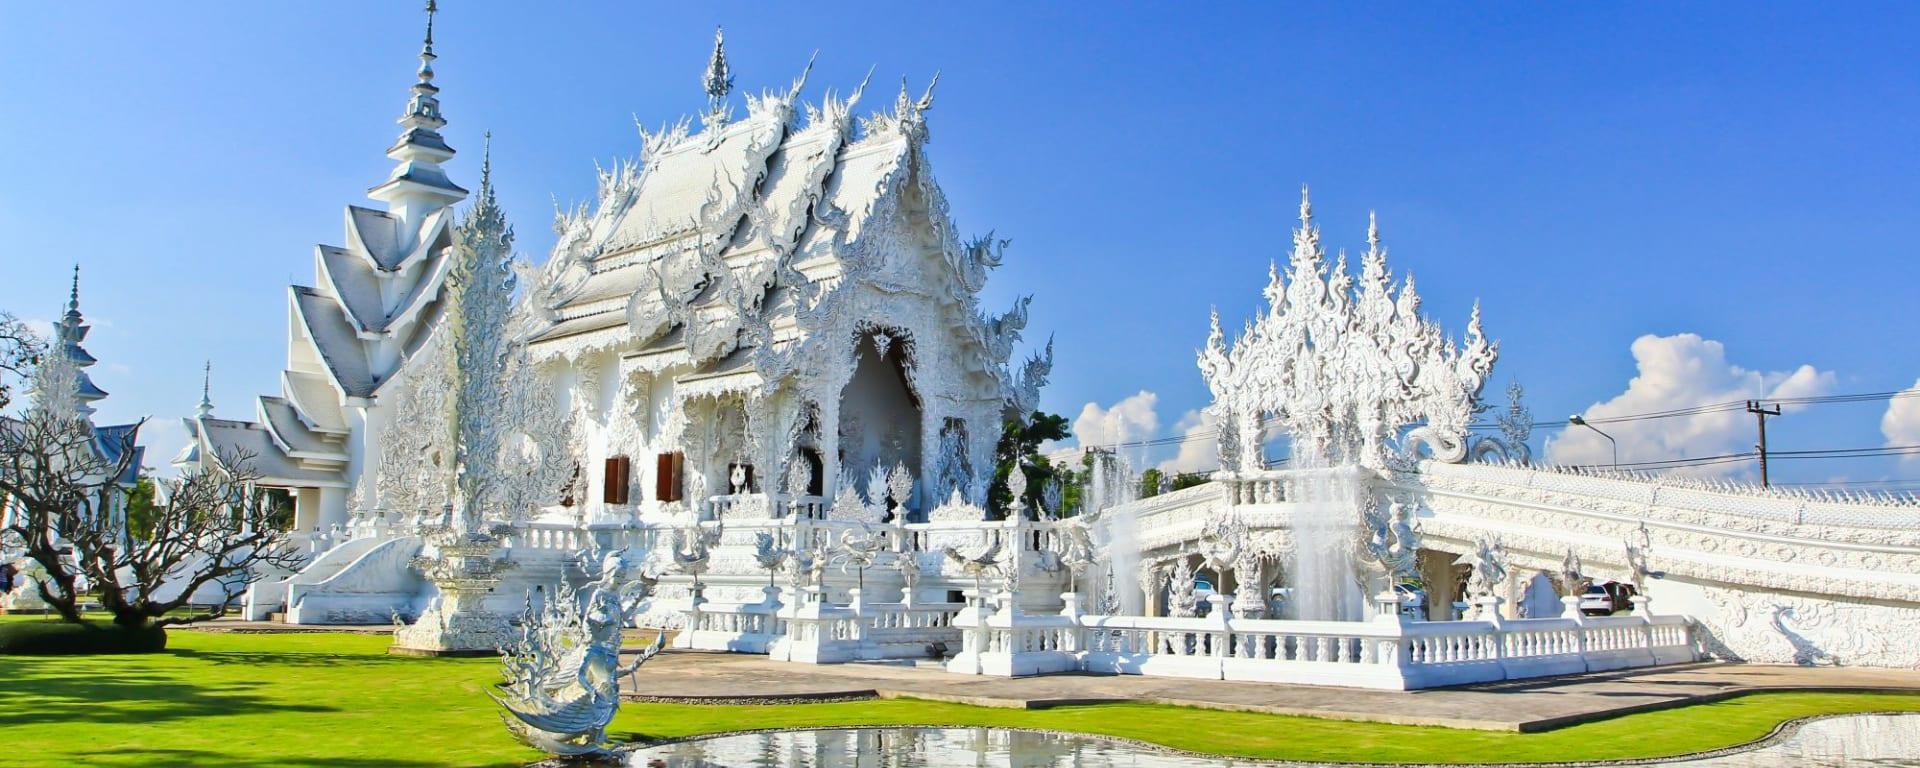 Voyages en Thaïlande | Vacances en Asie par tourasia: Chiang Rai Wat Rong Khun